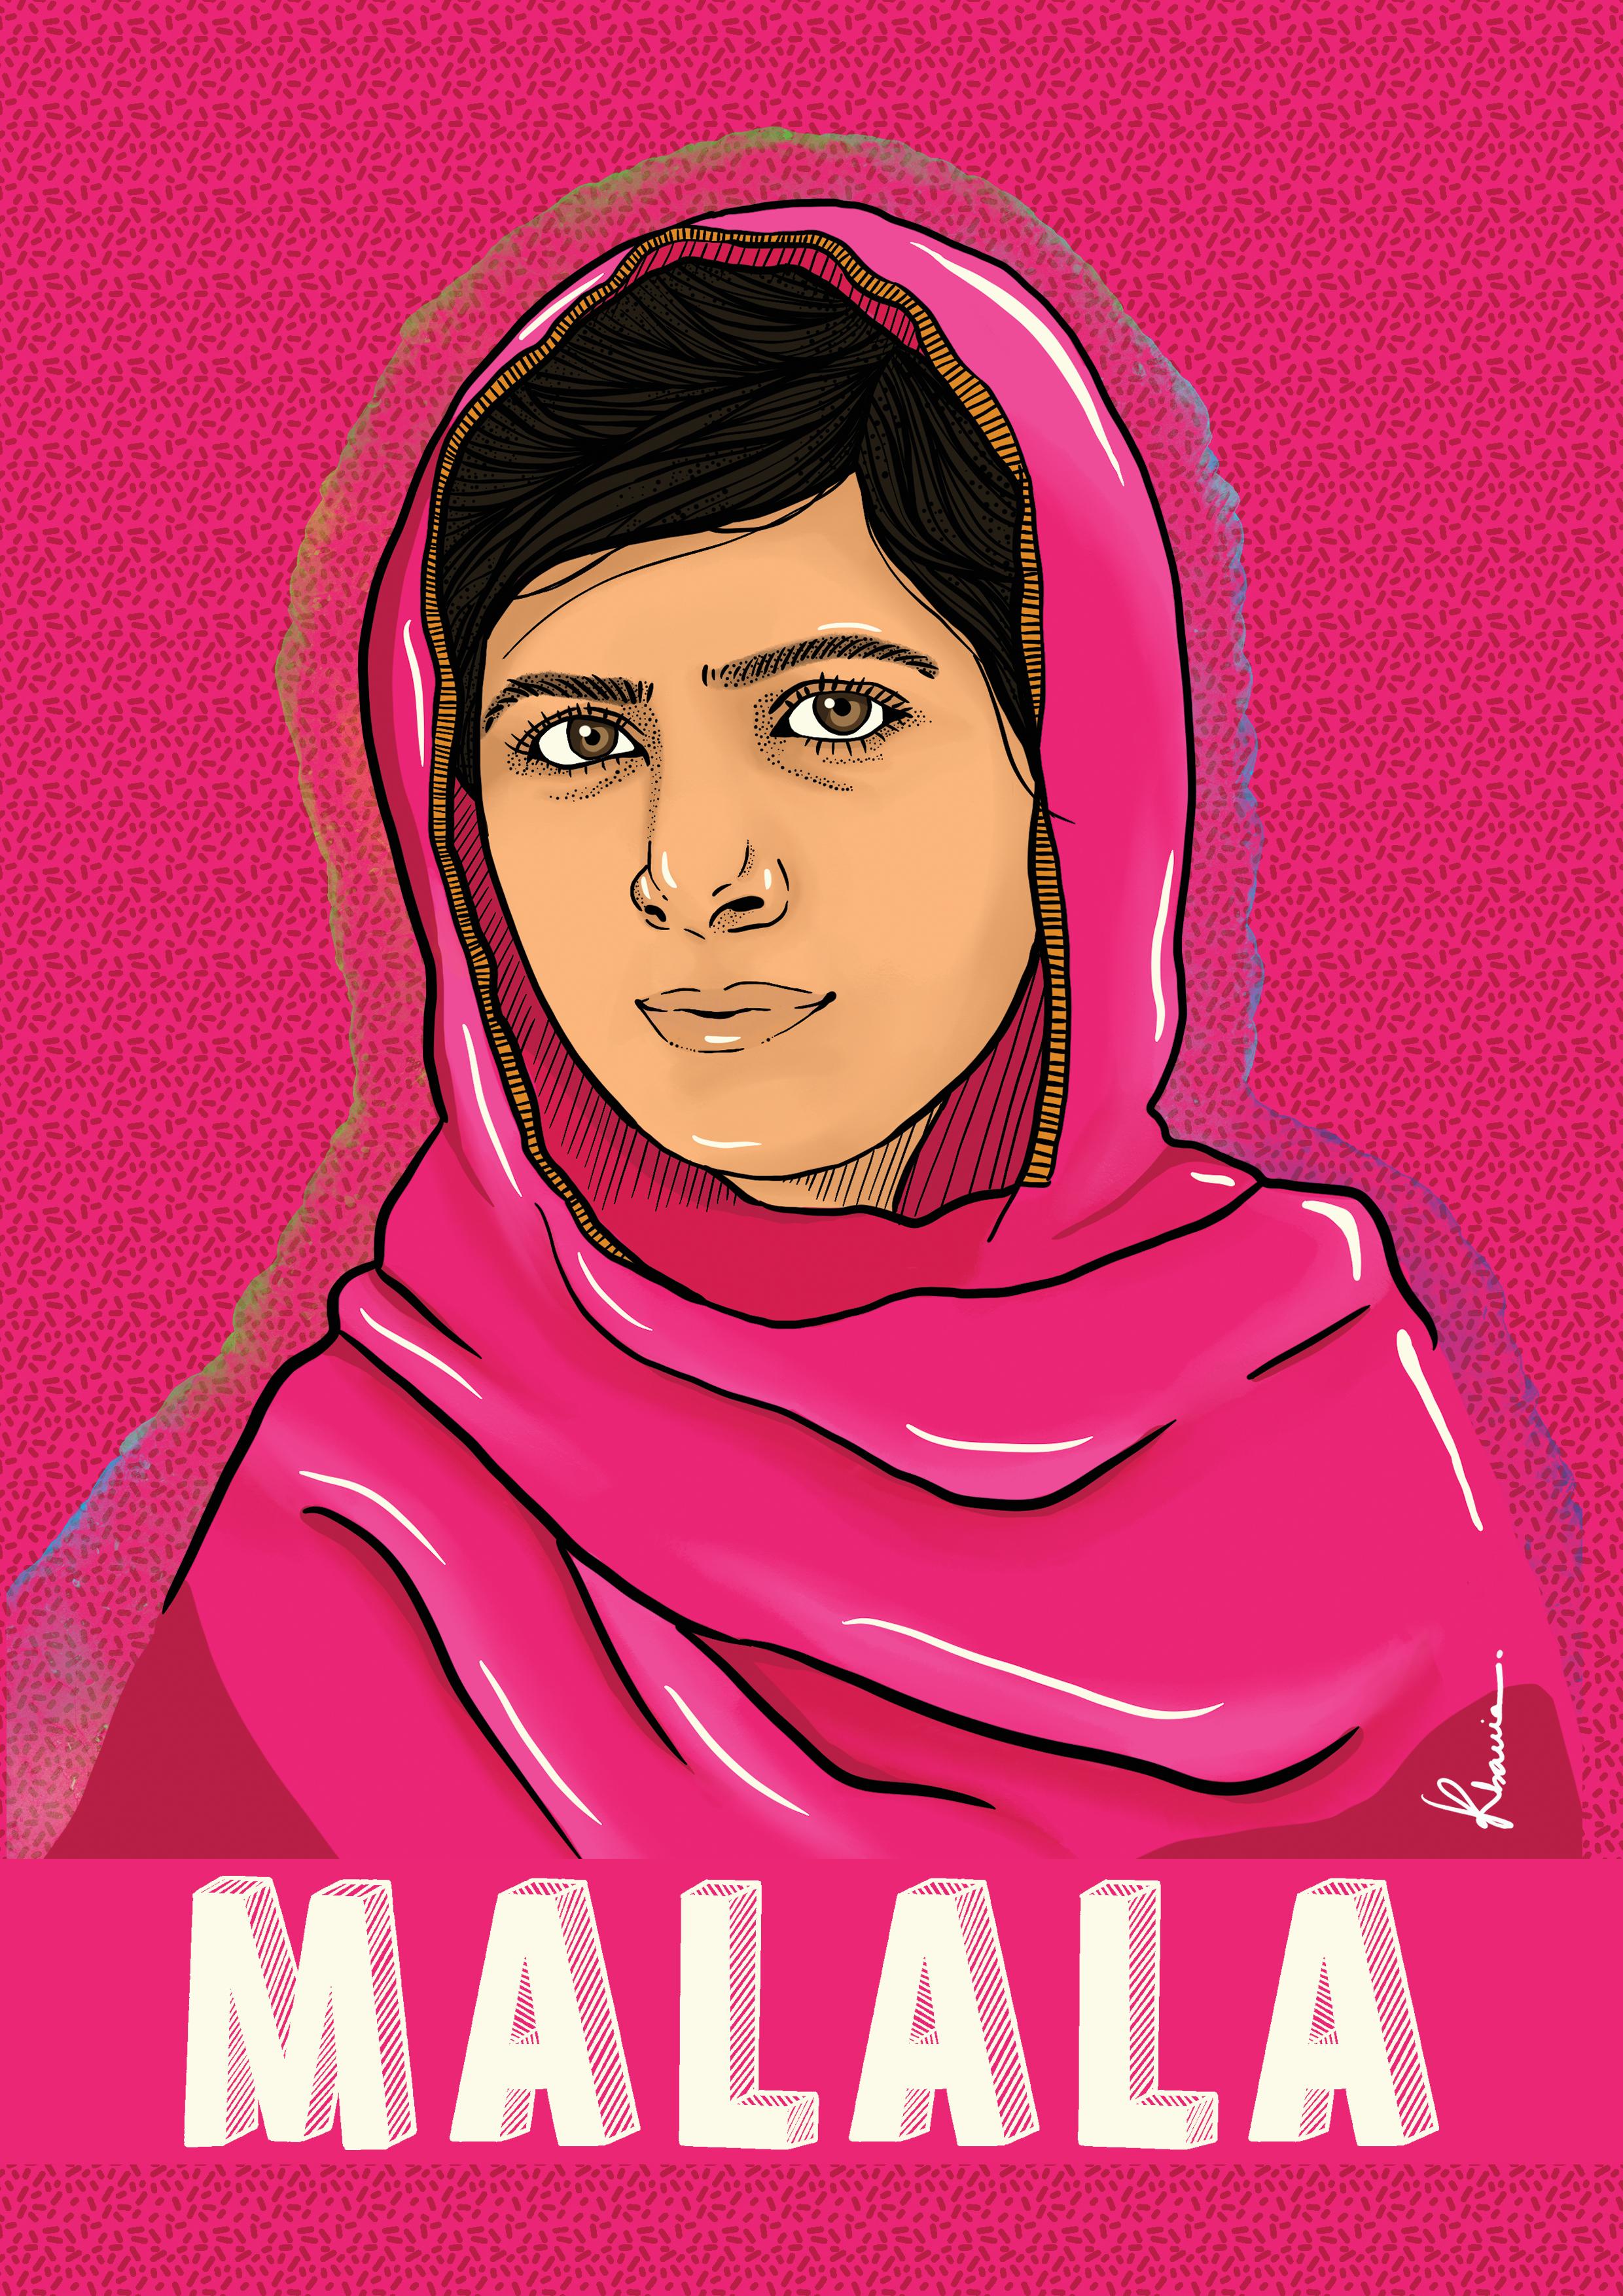 Malala by Katia Barria